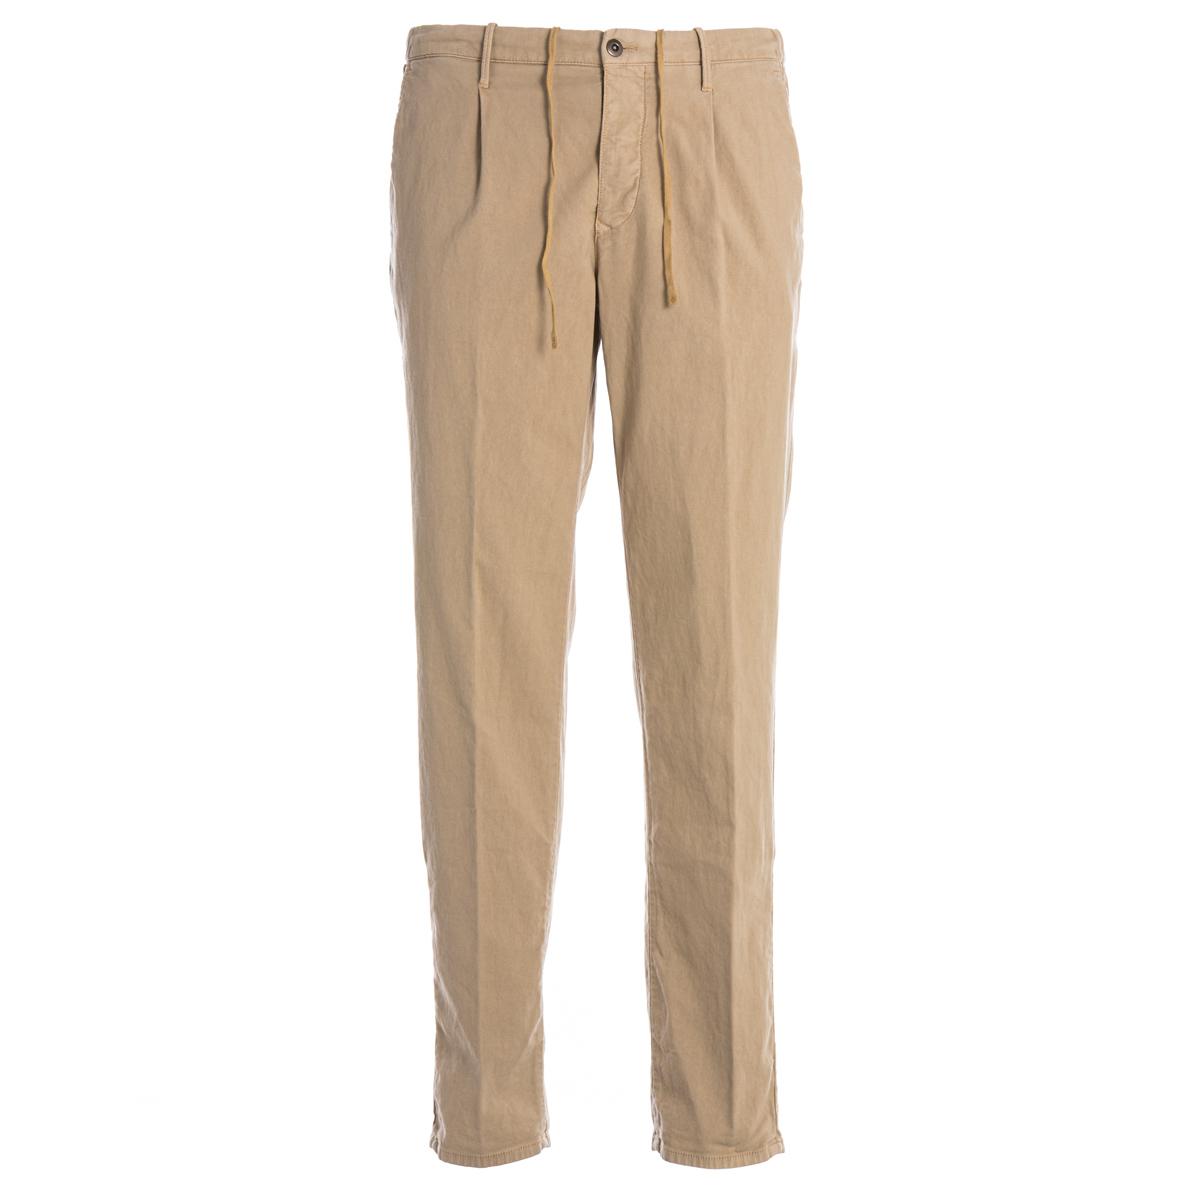 Pantalone Pence e Coulisse Incotex Slacks Beige modello Tappered